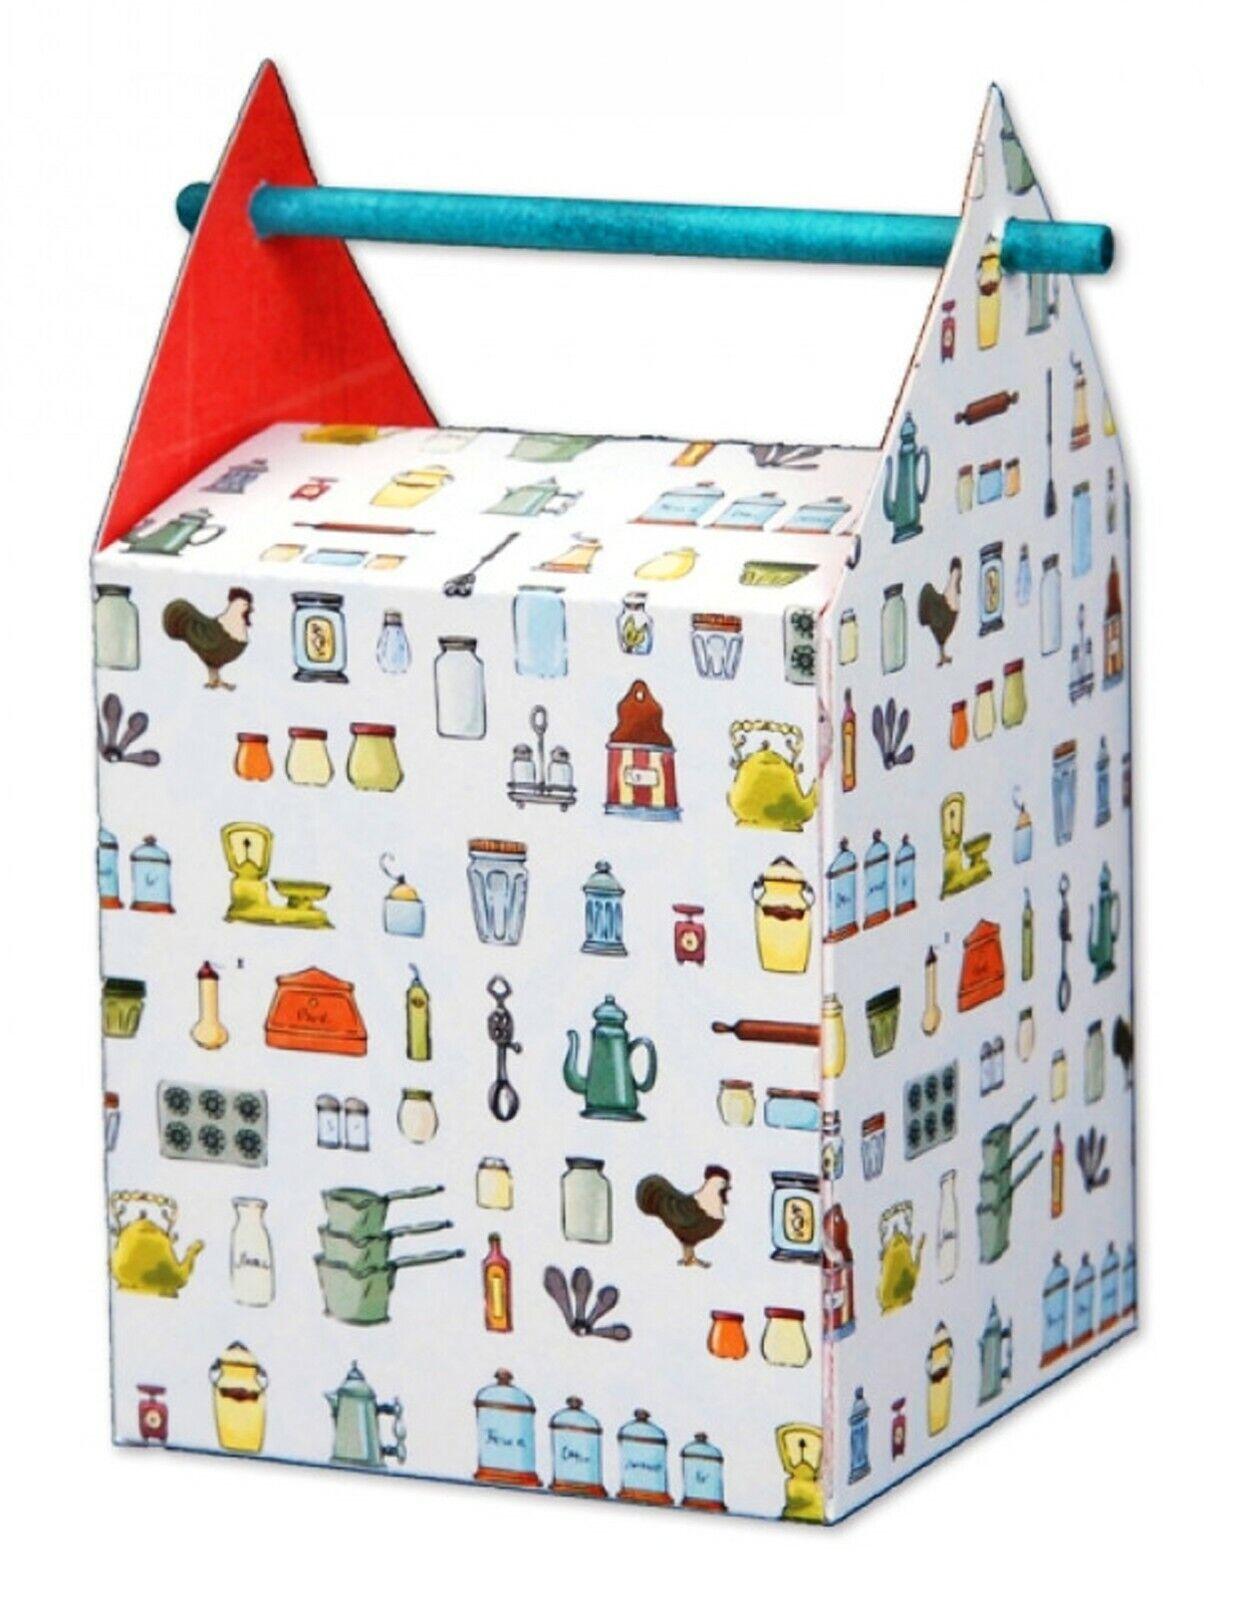 Sizzix Bigz L die Box with Stick Handle Hole #659536 Retail $29.99 SO FUN!